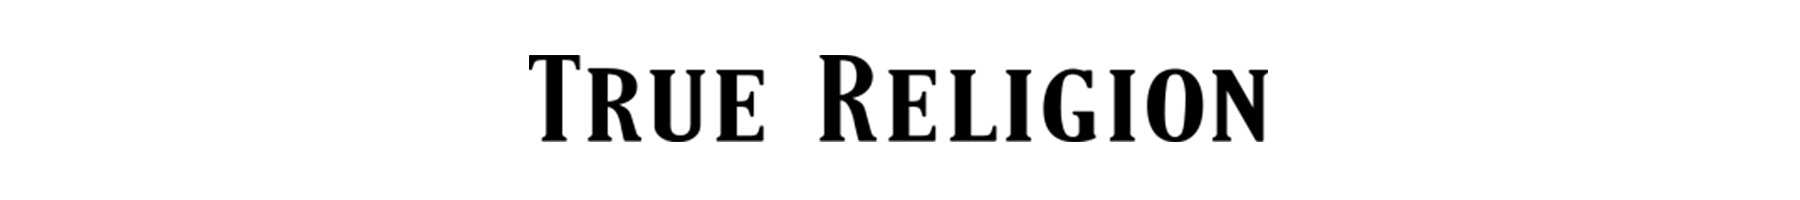 DrJays.com - True Religion